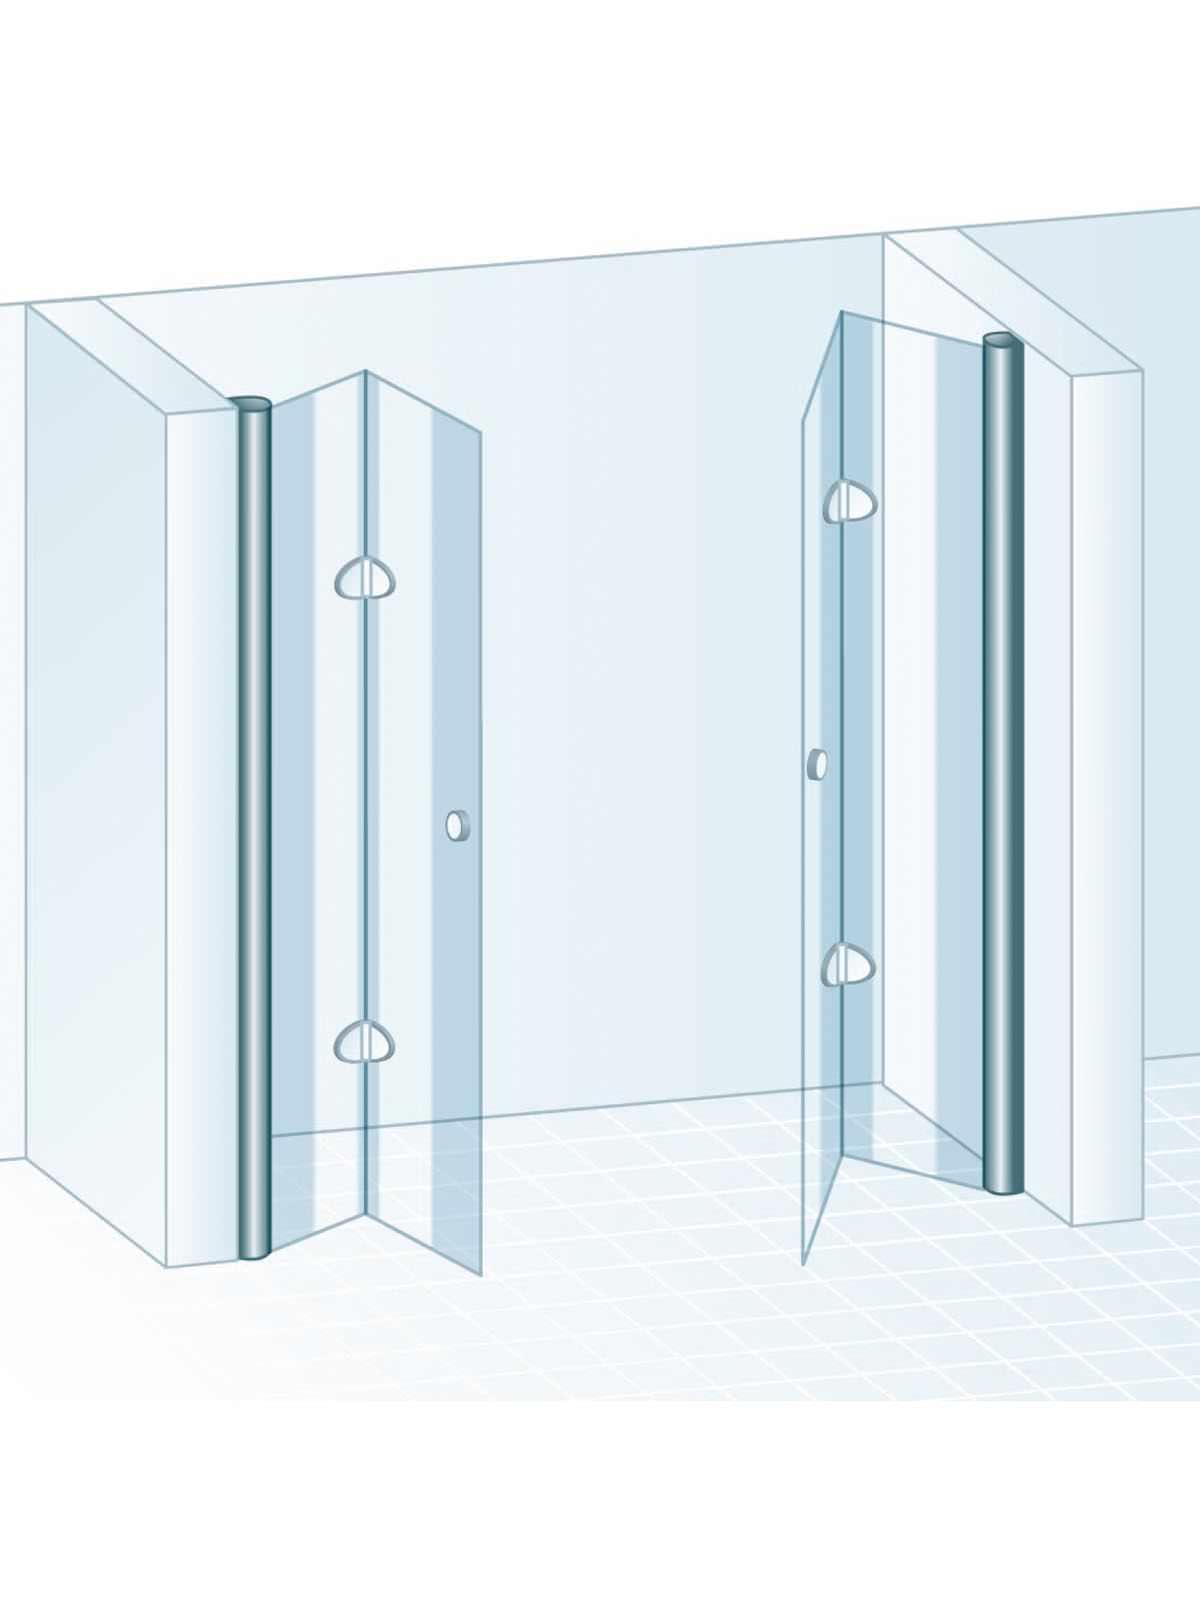 schulte garant drehfaltt r 4 teilig als pendelt r f r nische echtglas sonderma 2xd870199. Black Bedroom Furniture Sets. Home Design Ideas